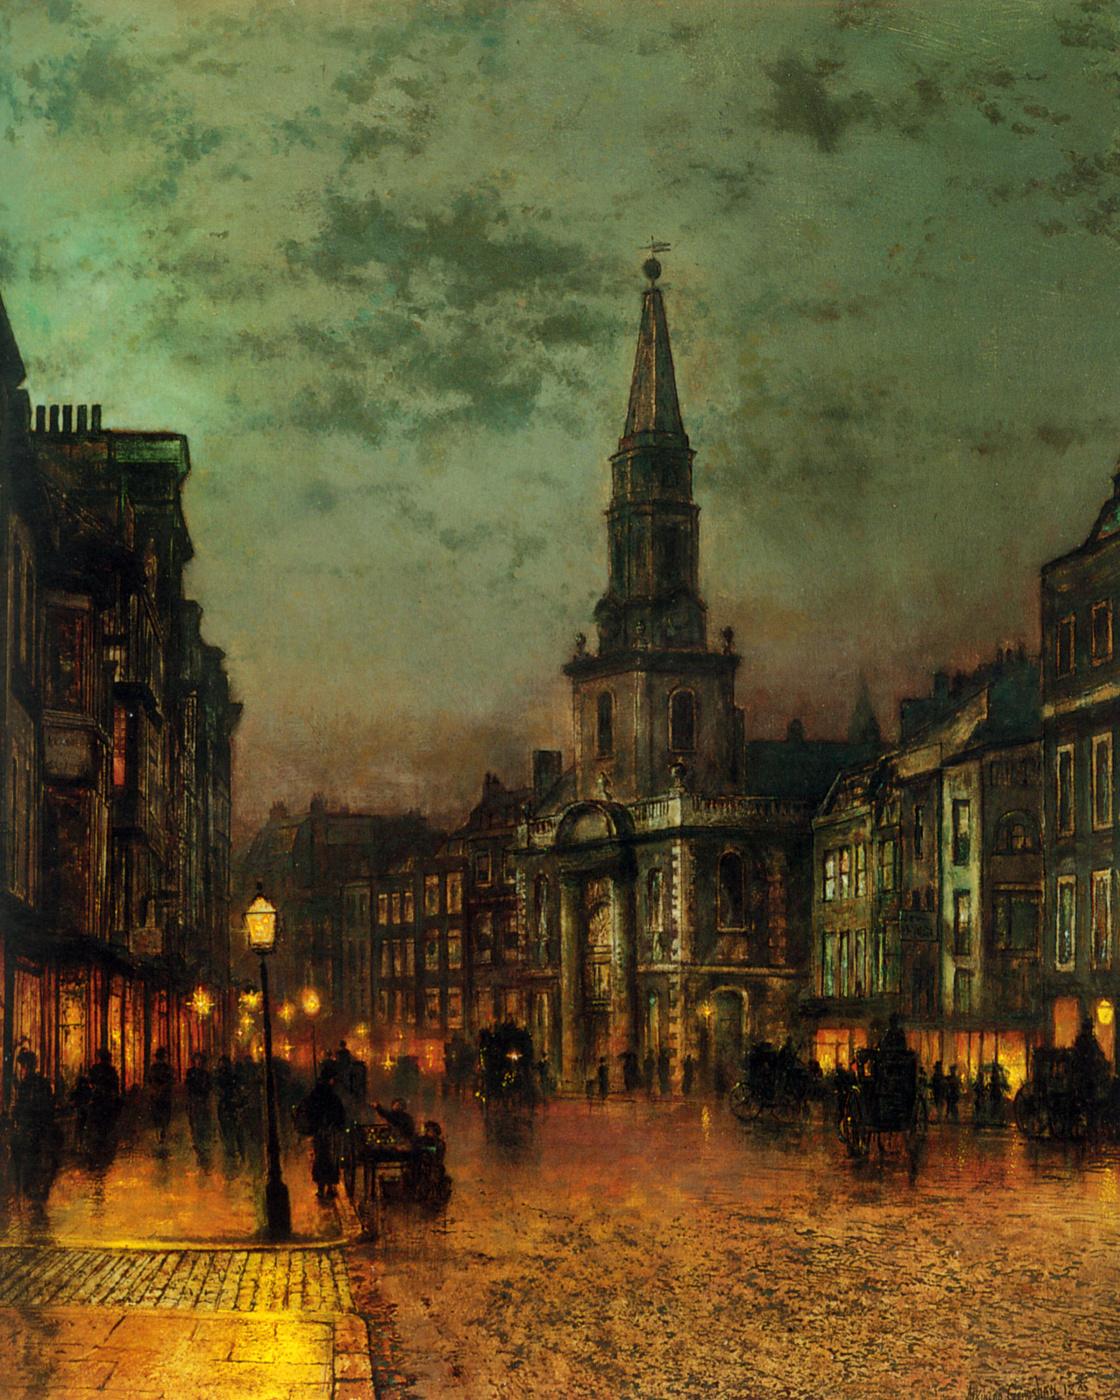 John Atkinson Grimshaw. Blackman Street, London